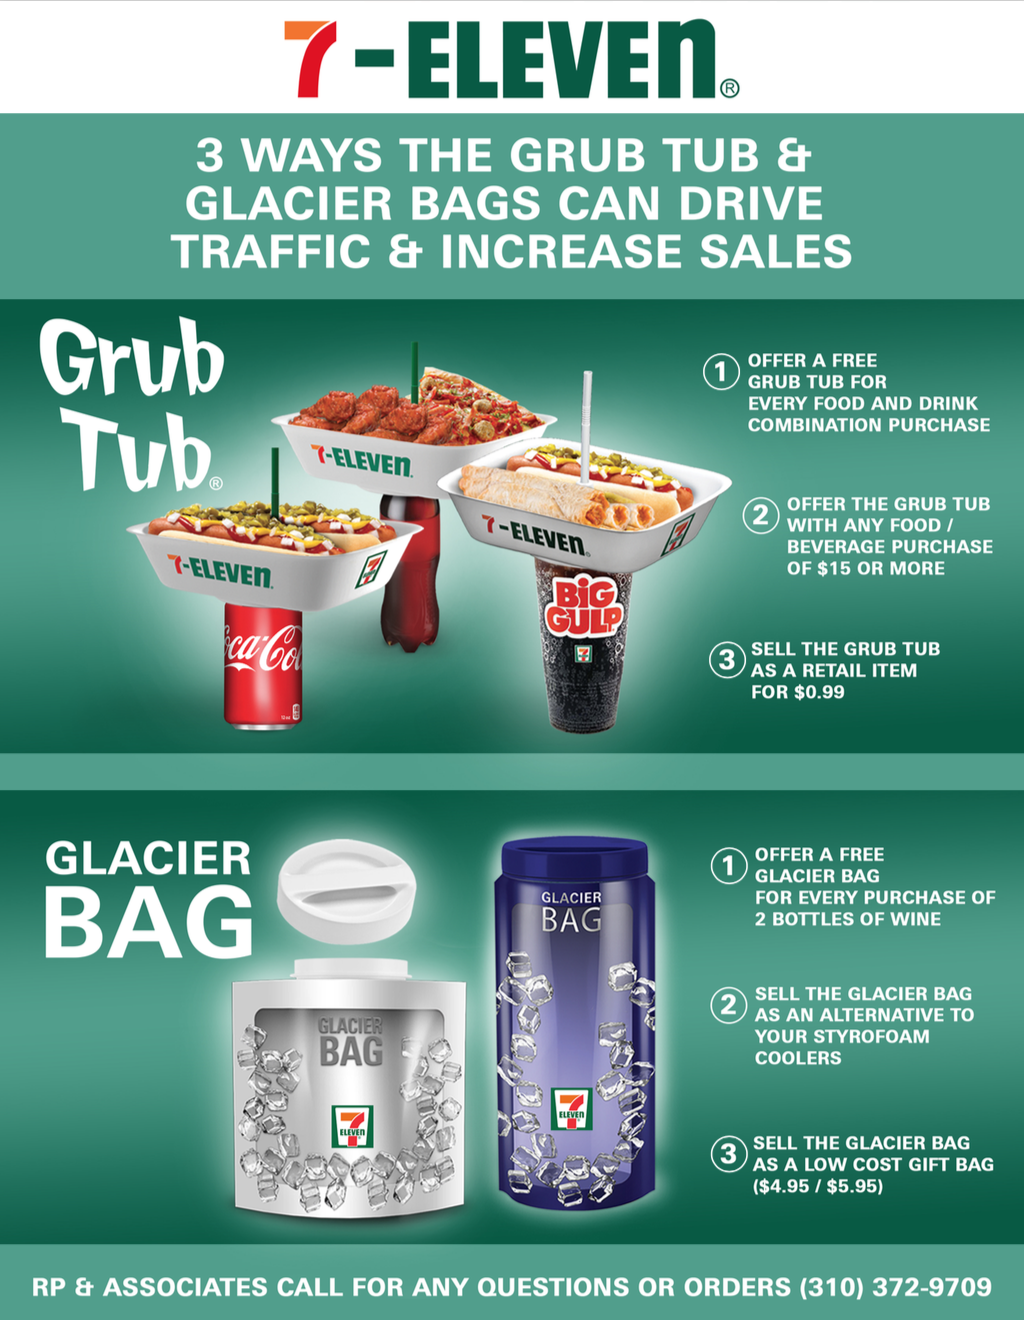 grub tub glacier bag 7-eleven